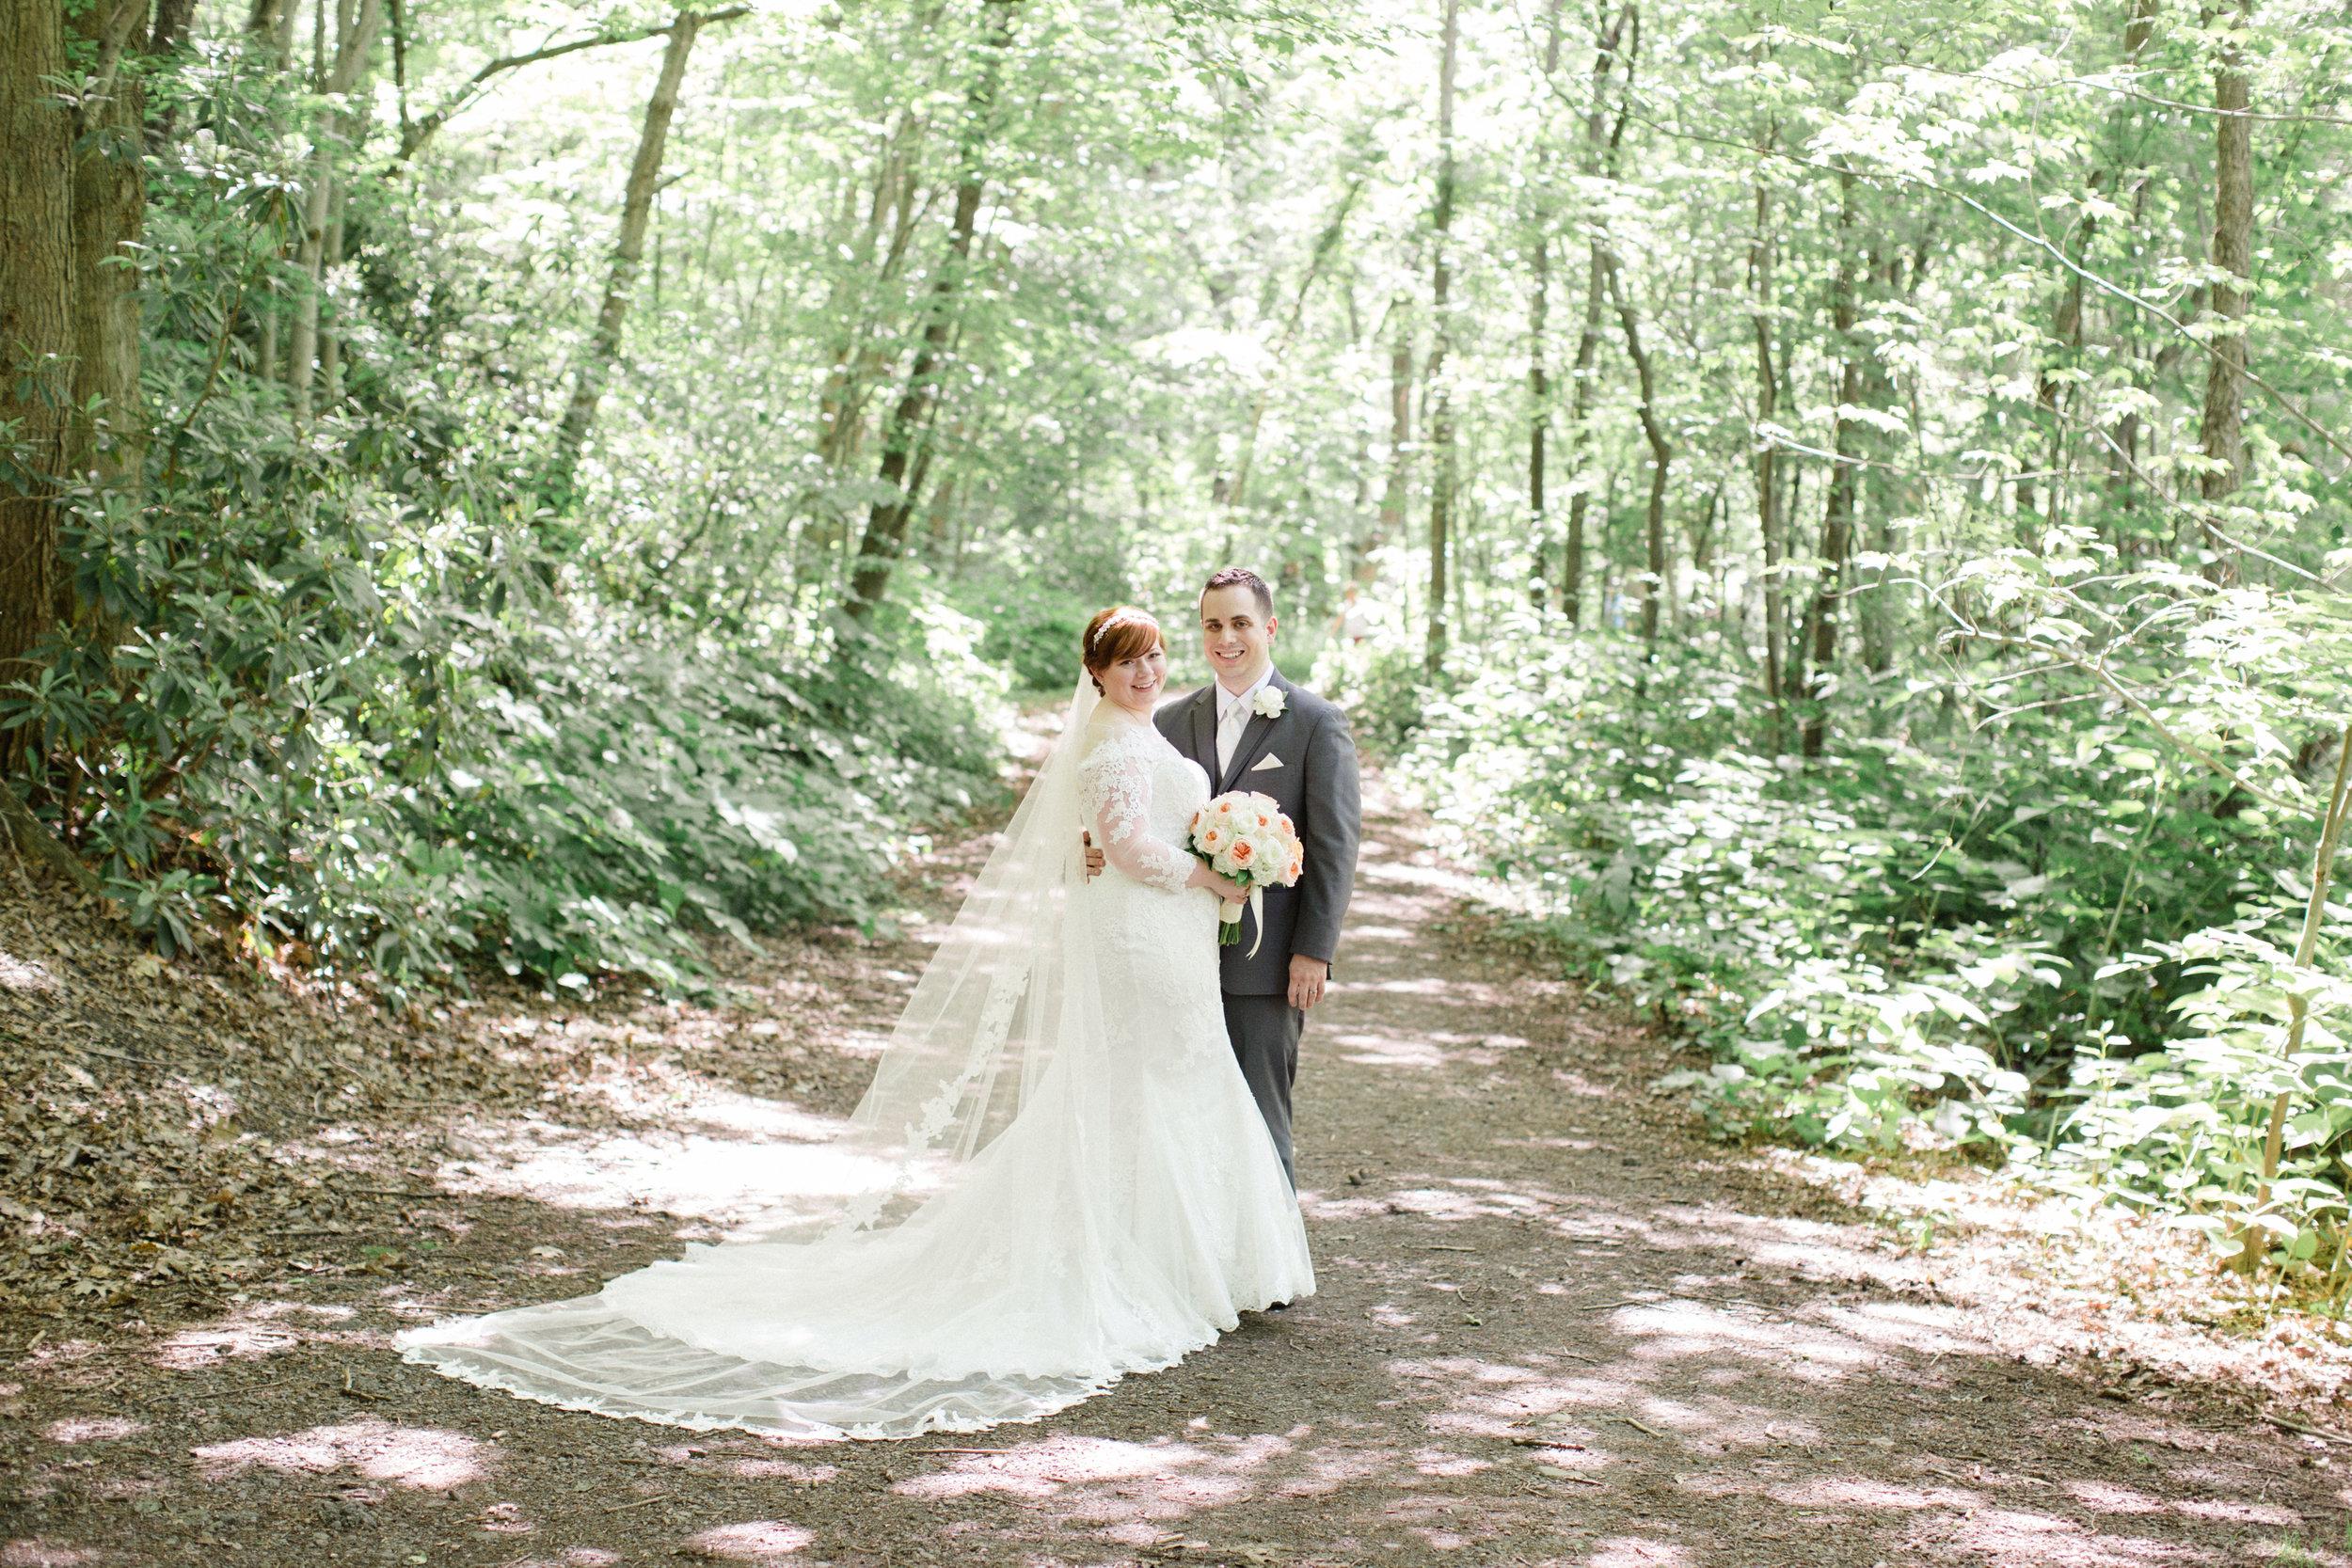 Fiorellis Wedding Photos_JDP-107.jpg